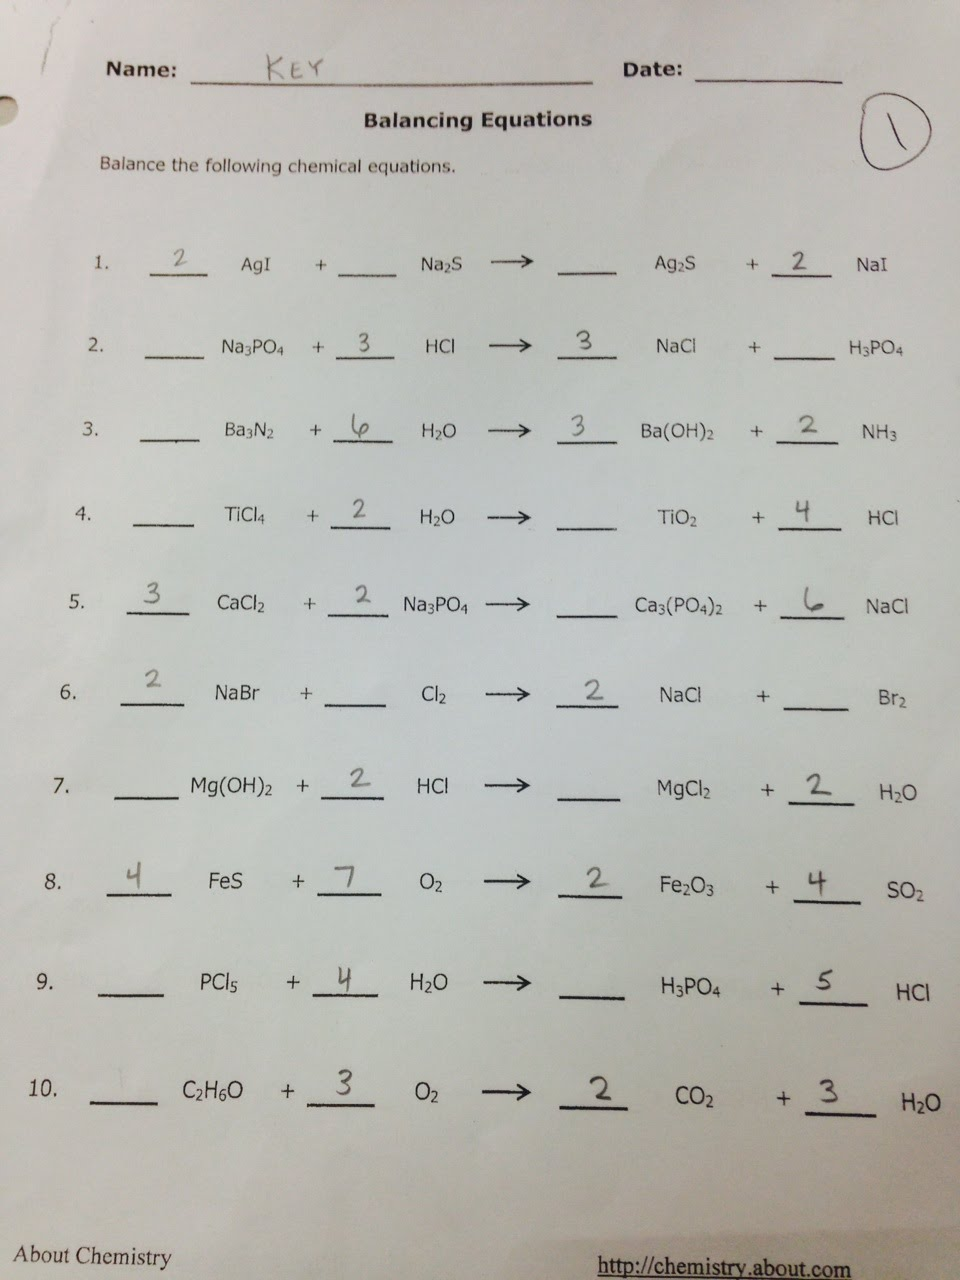 Balancing Equations Worksheet Prentice Hall  144177